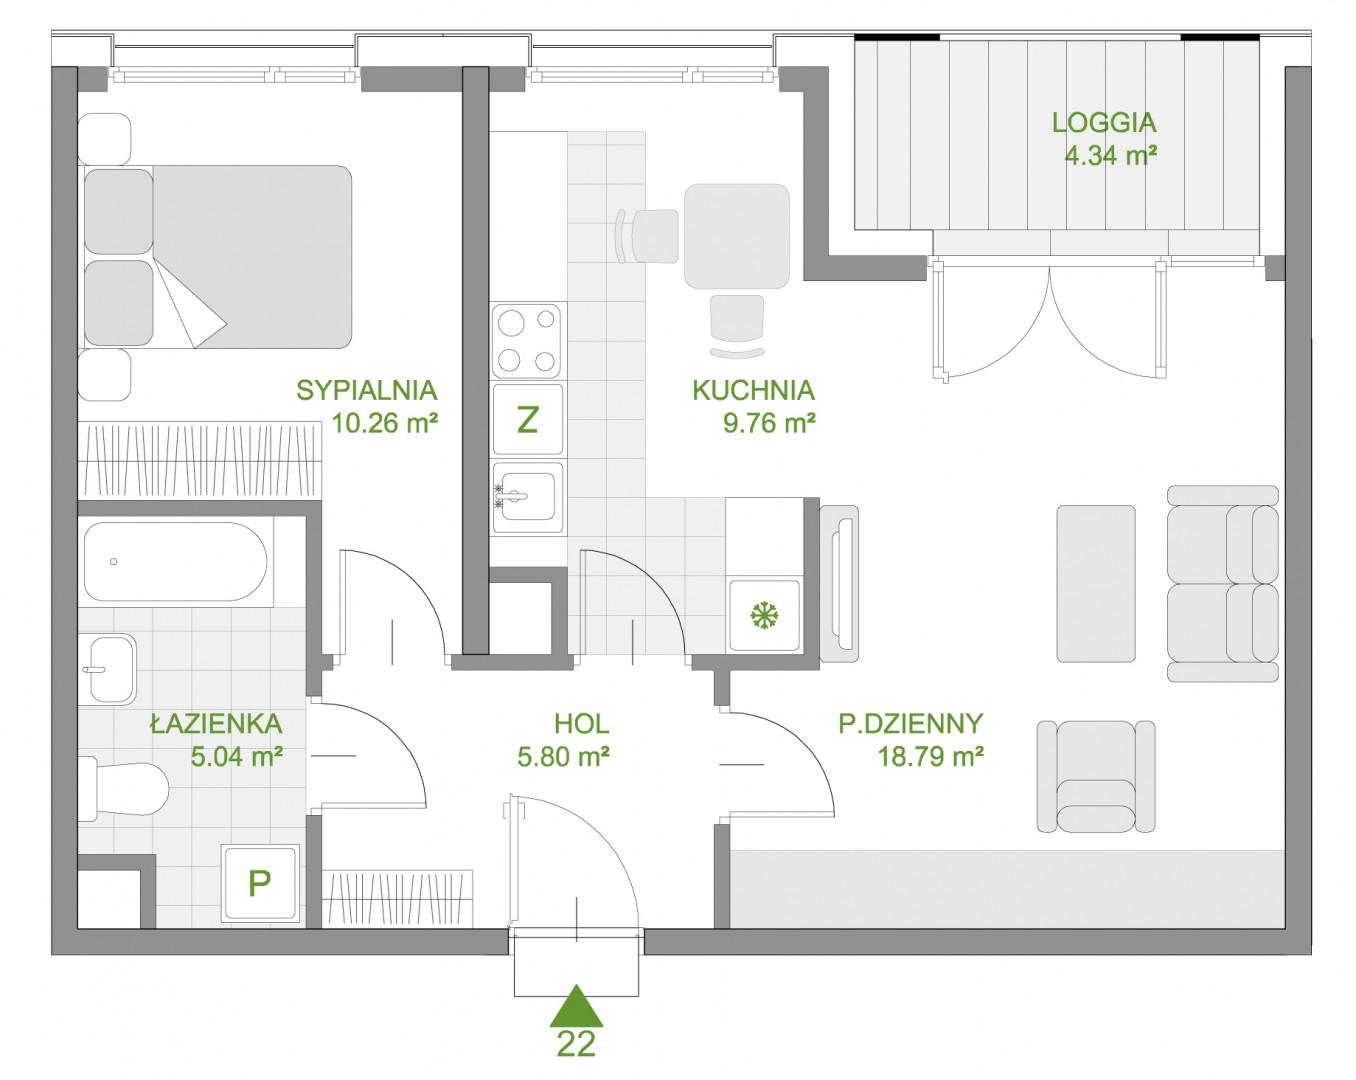 Mazowiecka 72 / apartament nr 22 rzut 1